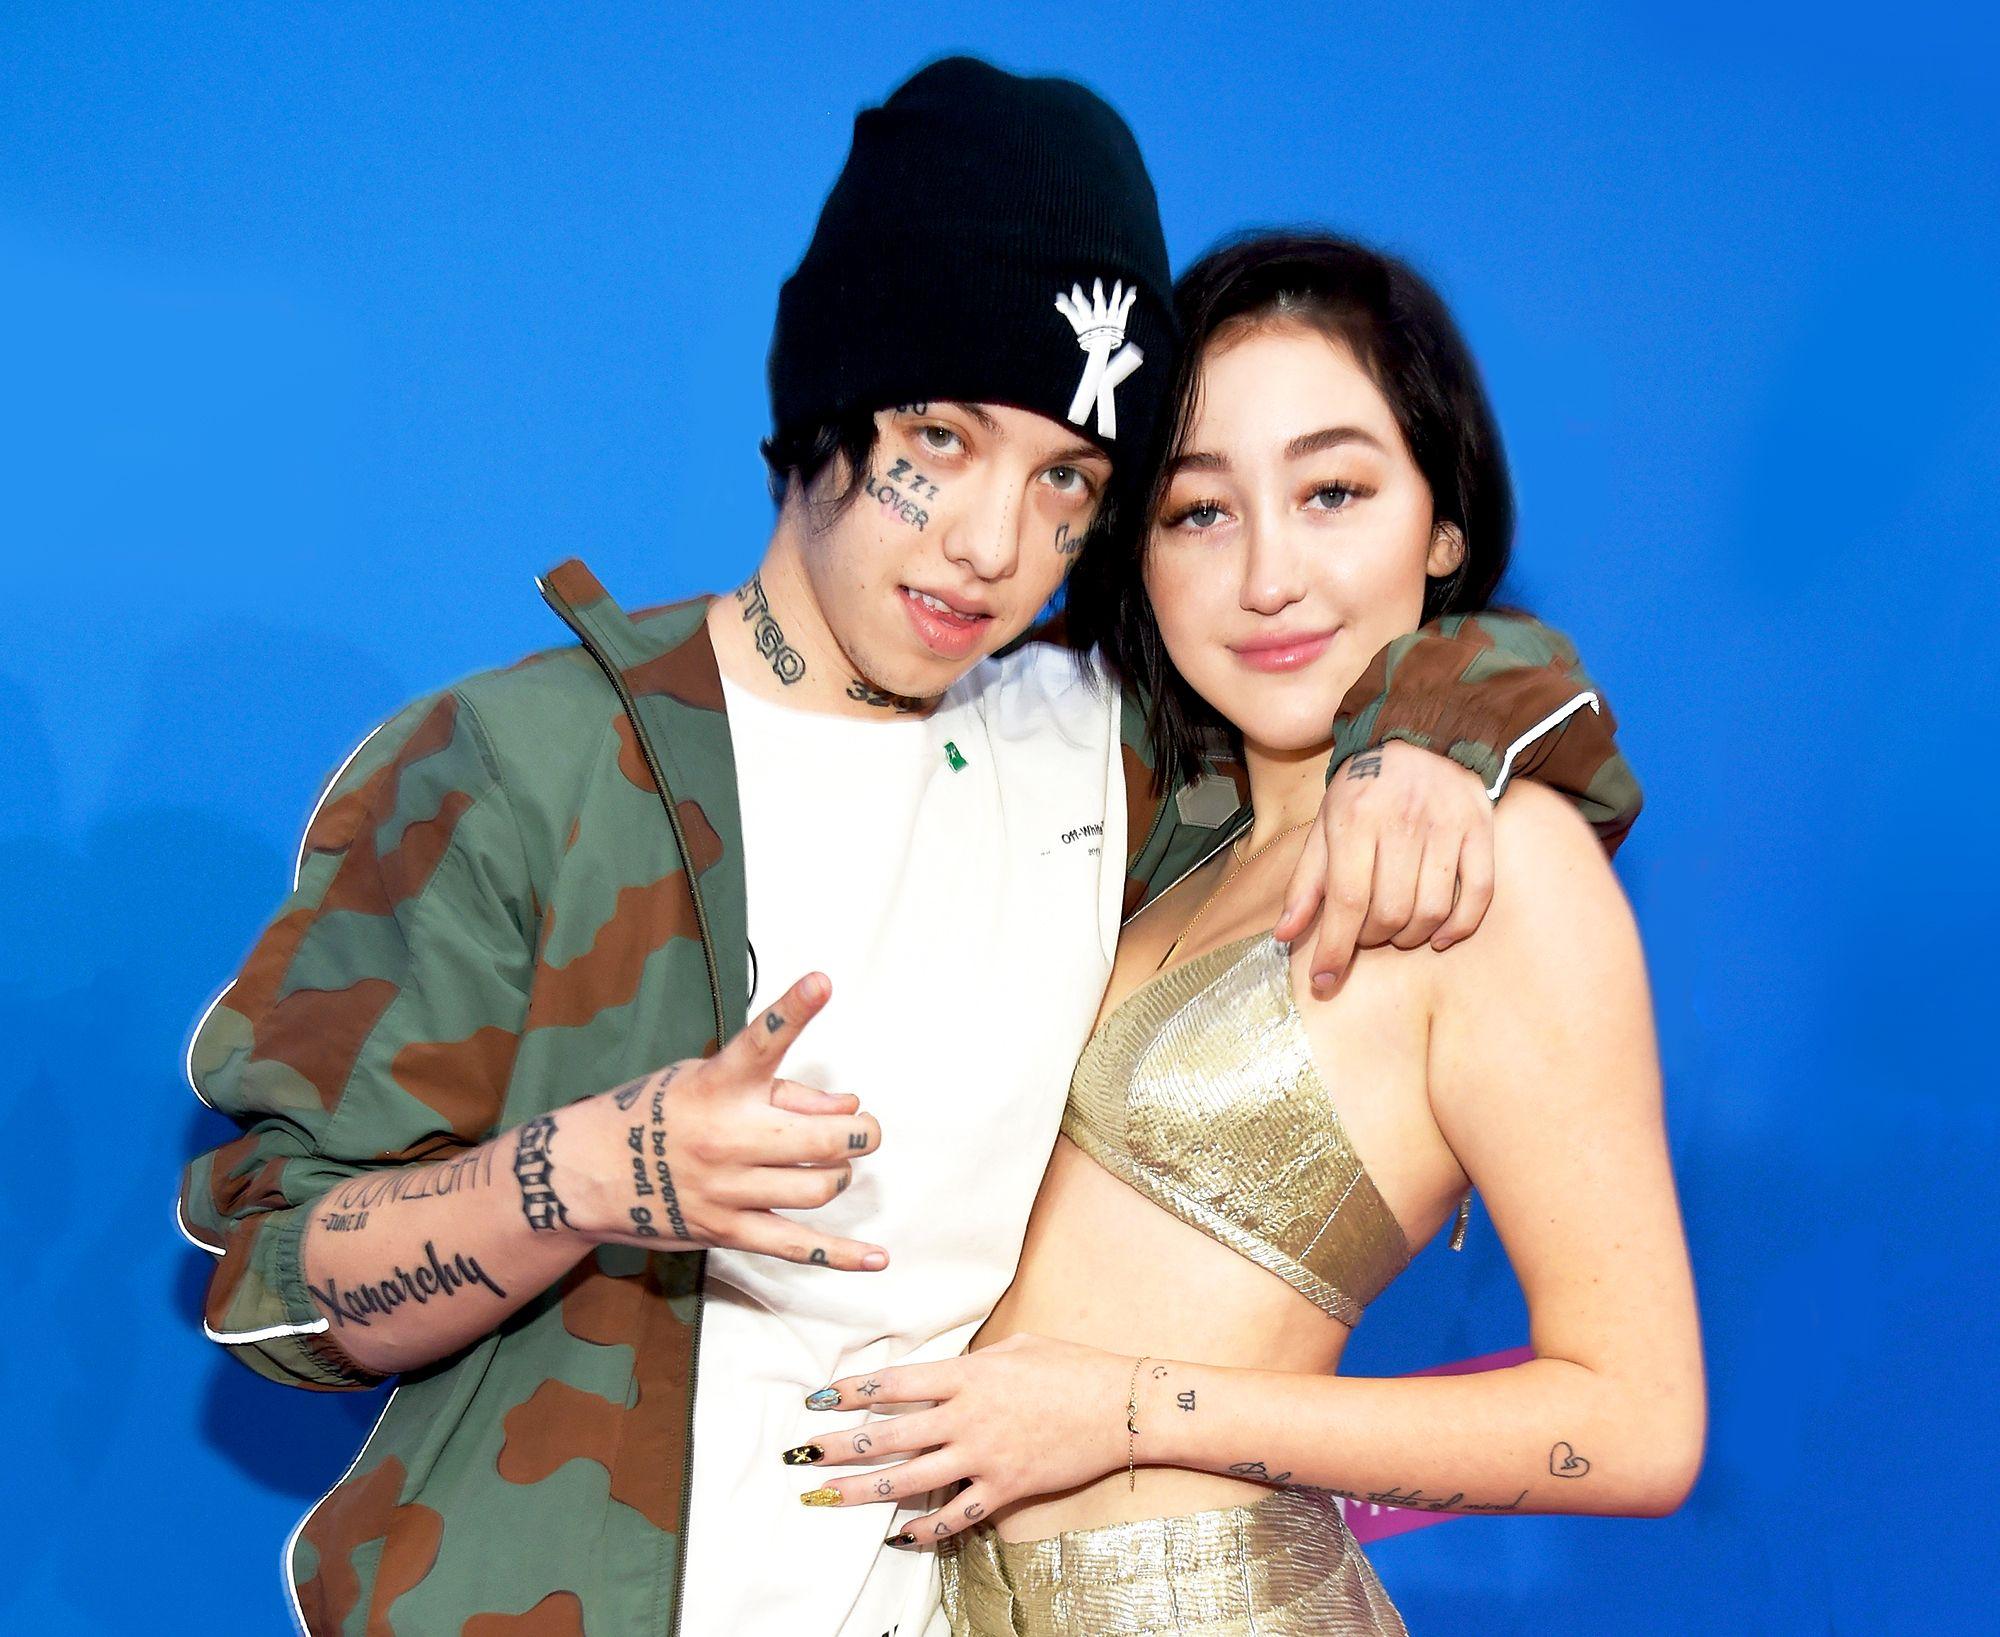 lil xan and noah